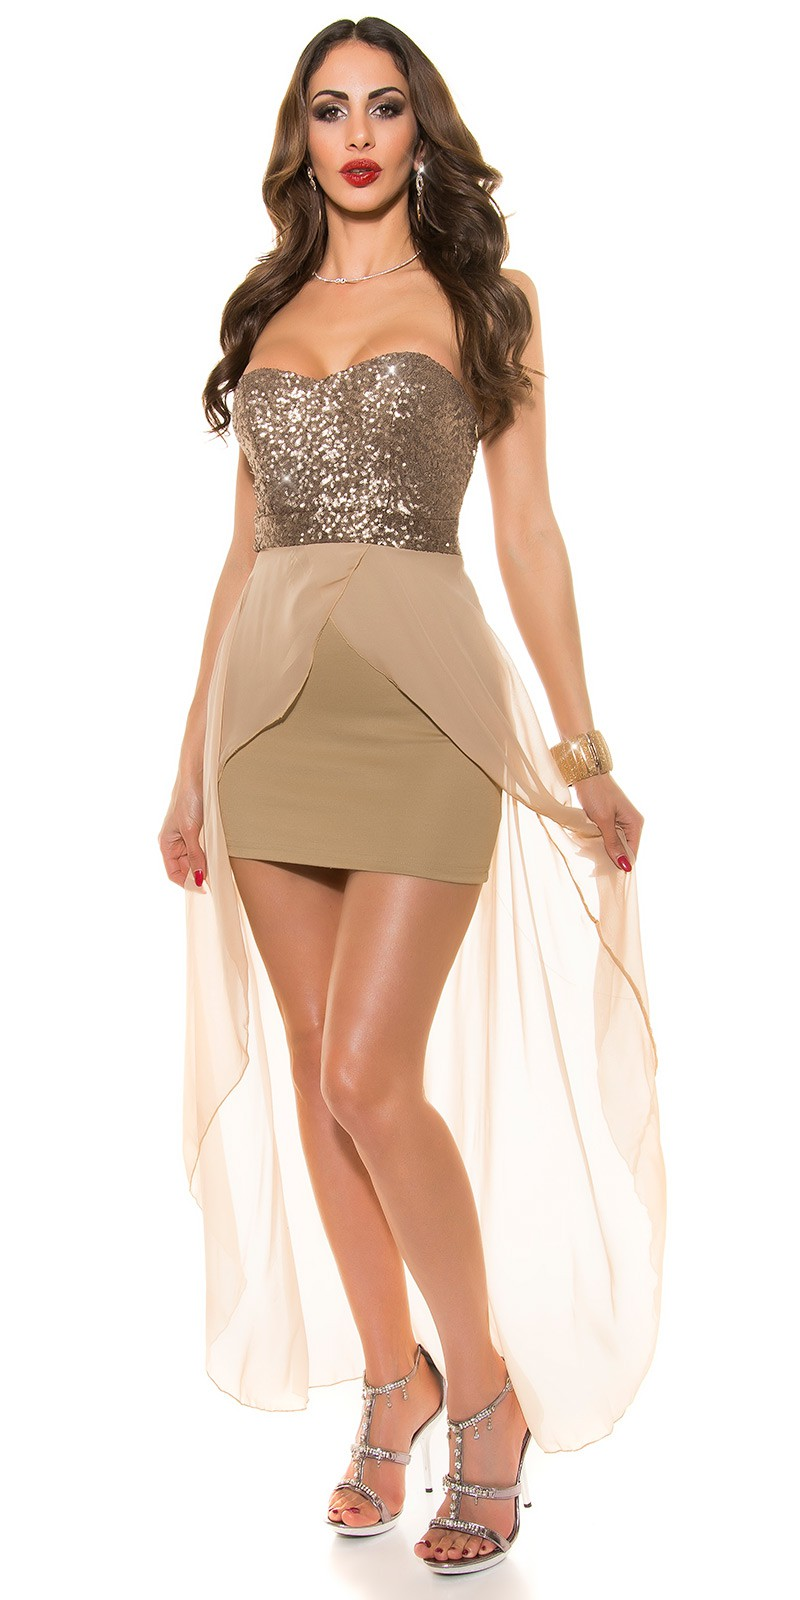 Výprodej - sleva - plesové šaty SELENA polodlouhé  2dff3728950